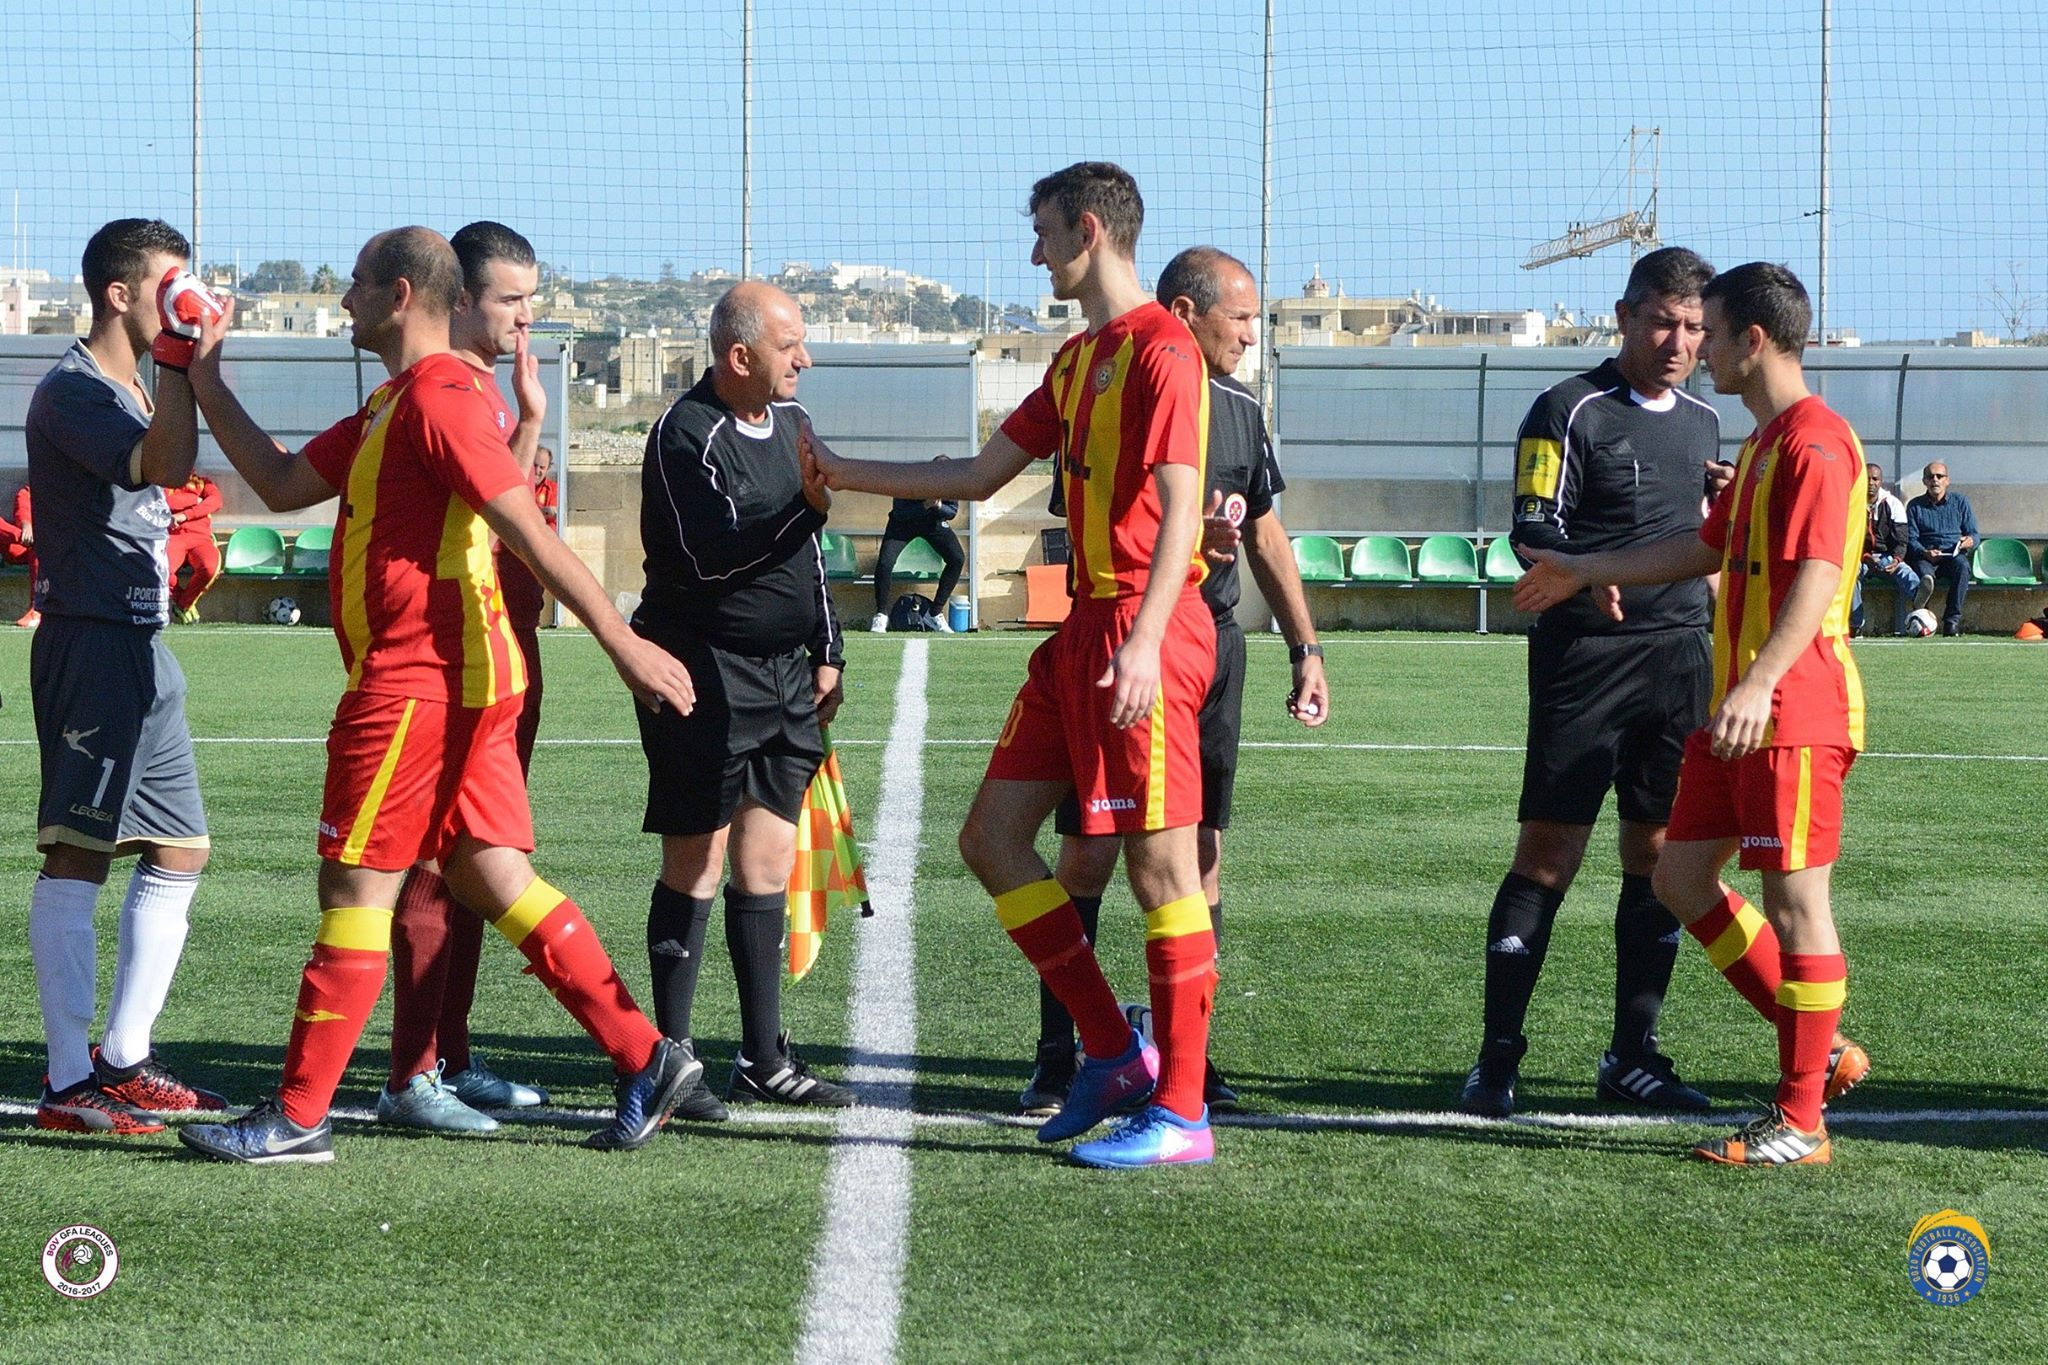 A brace by Jordi Parnis brace leads Munxar to another win